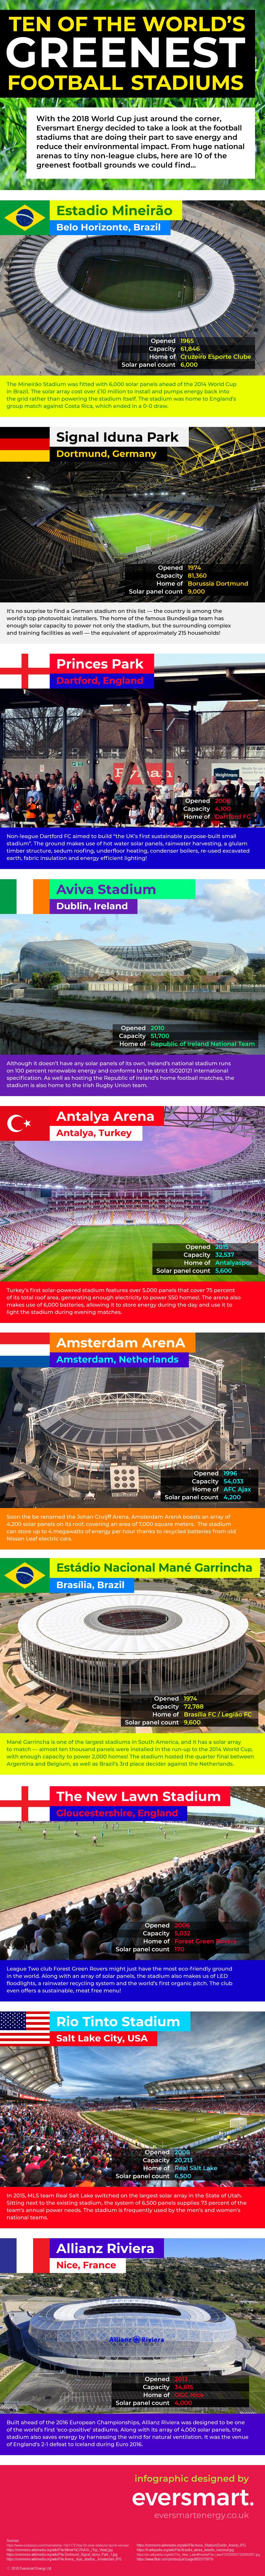 Eco-friendly stadiums